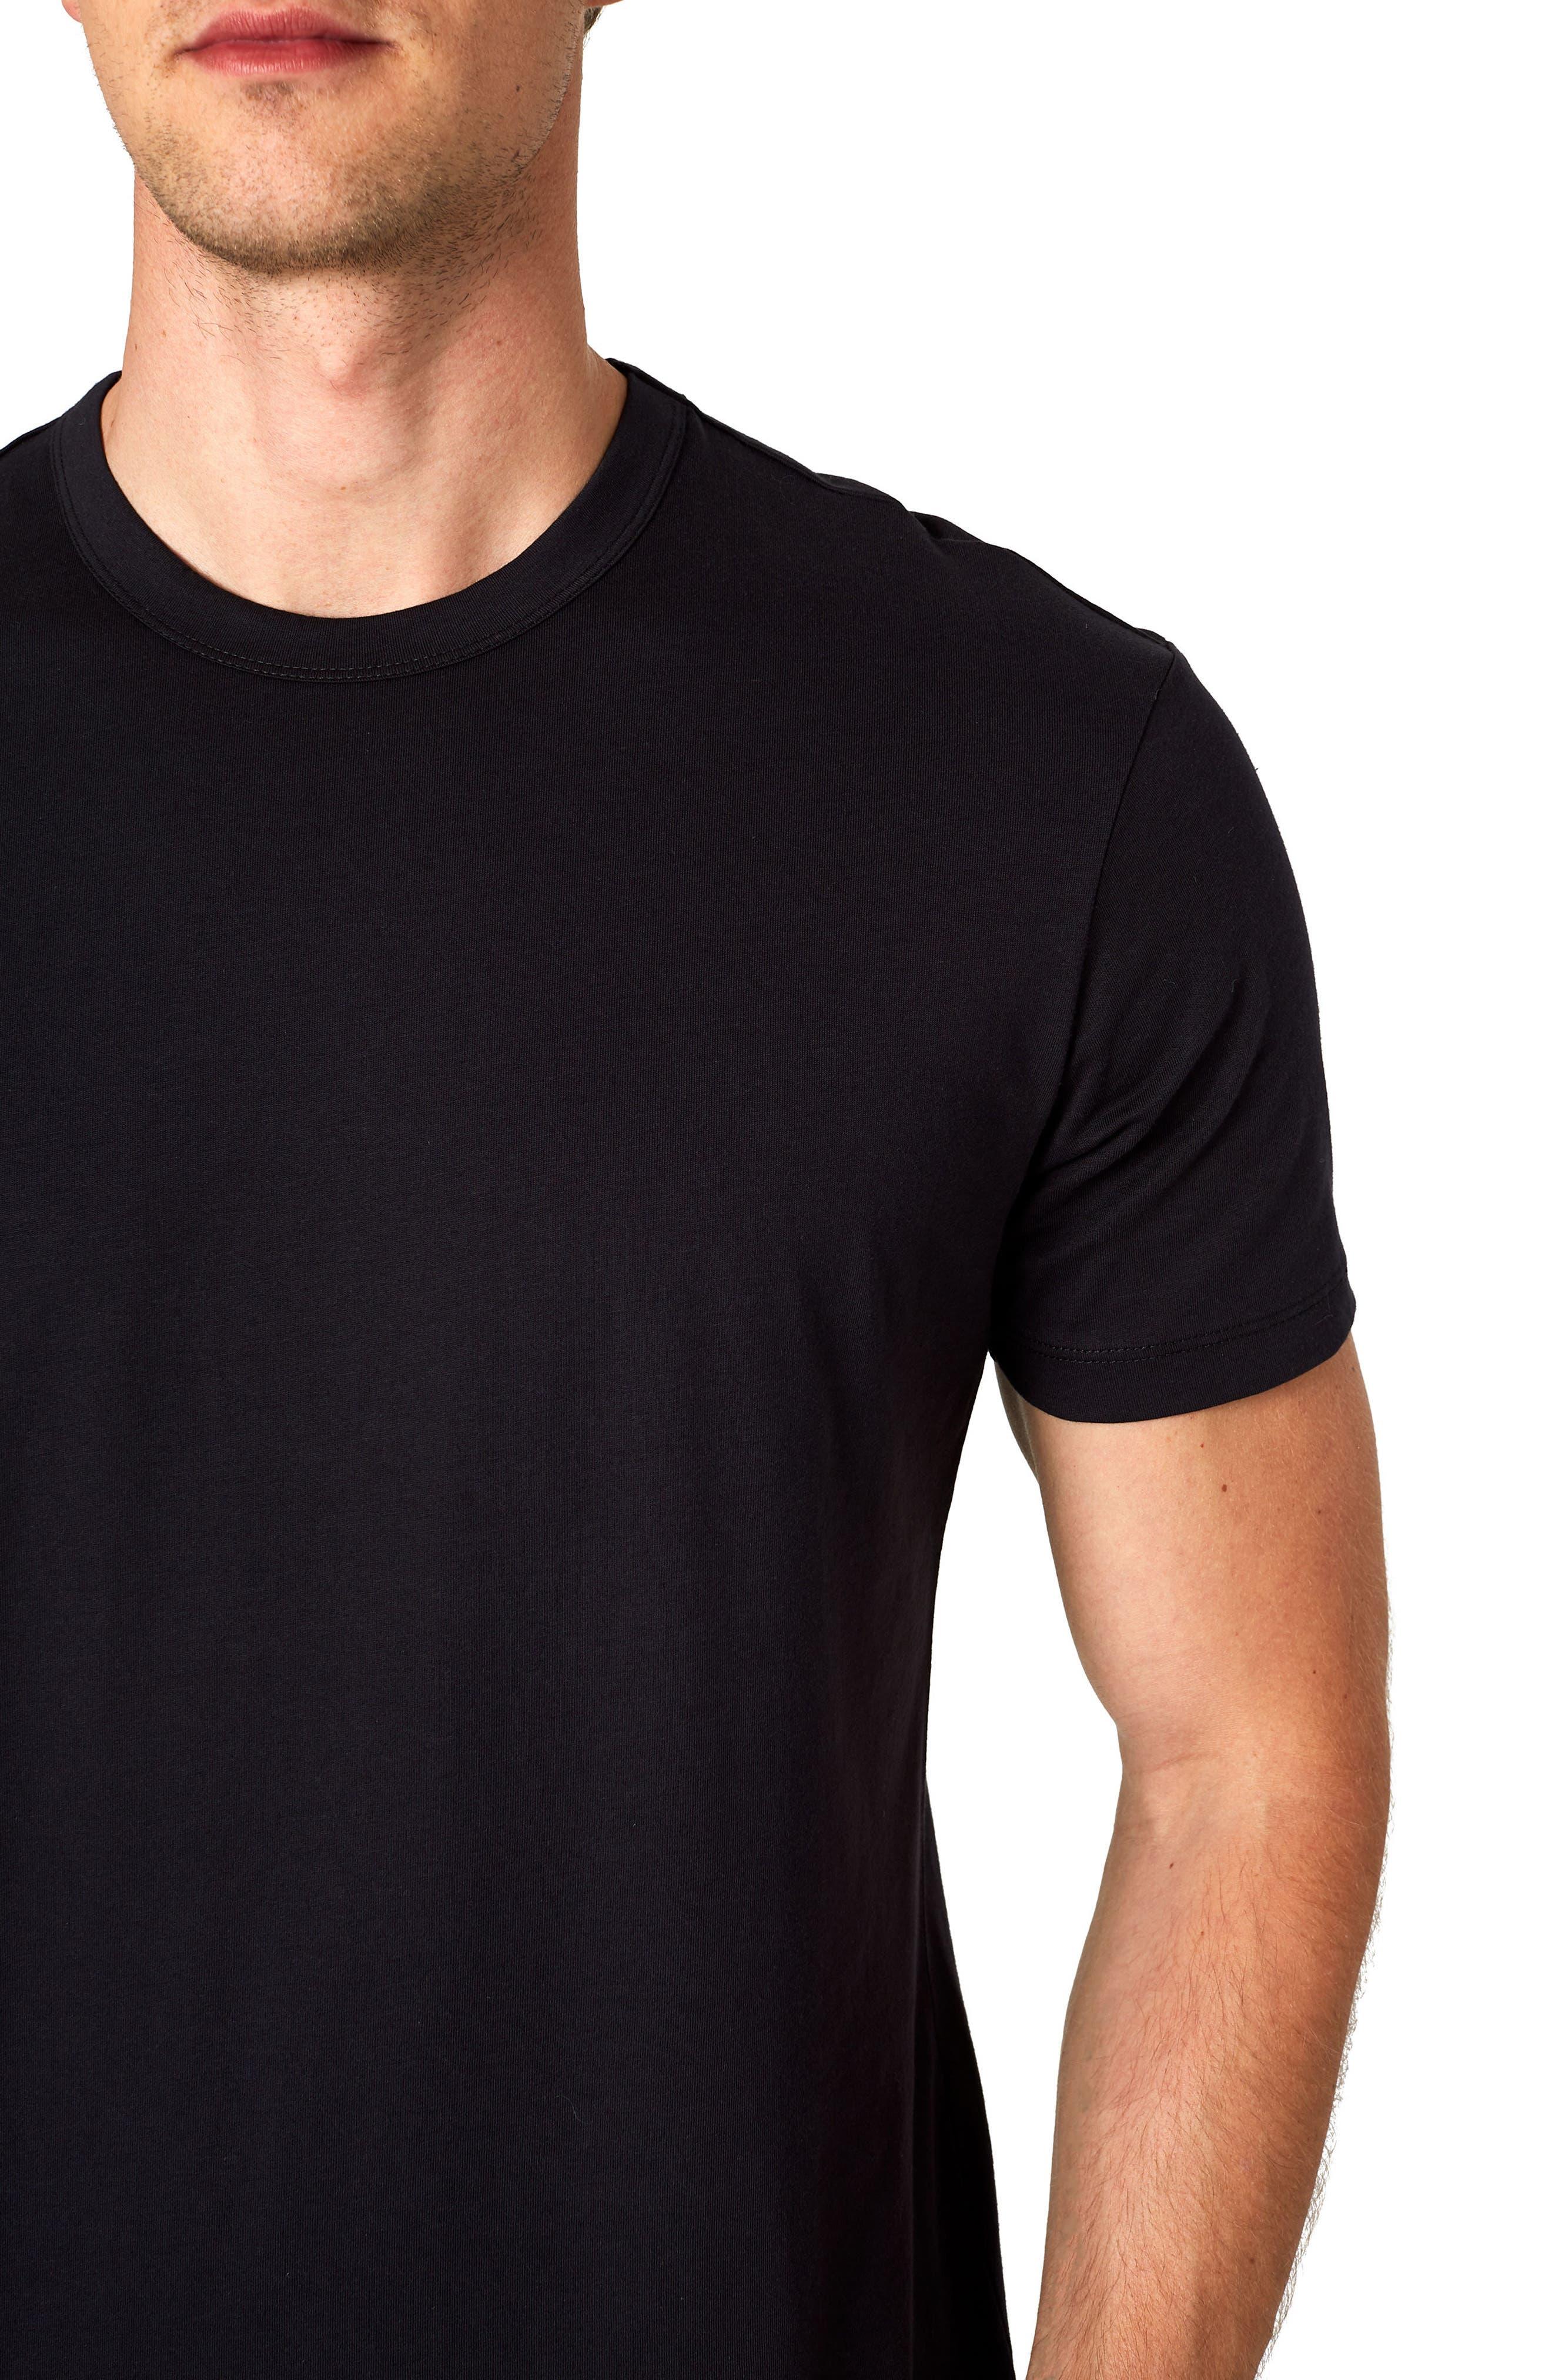 Iqonicq Crewneck T-Shirt,                             Alternate thumbnail 4, color,                             BLACK